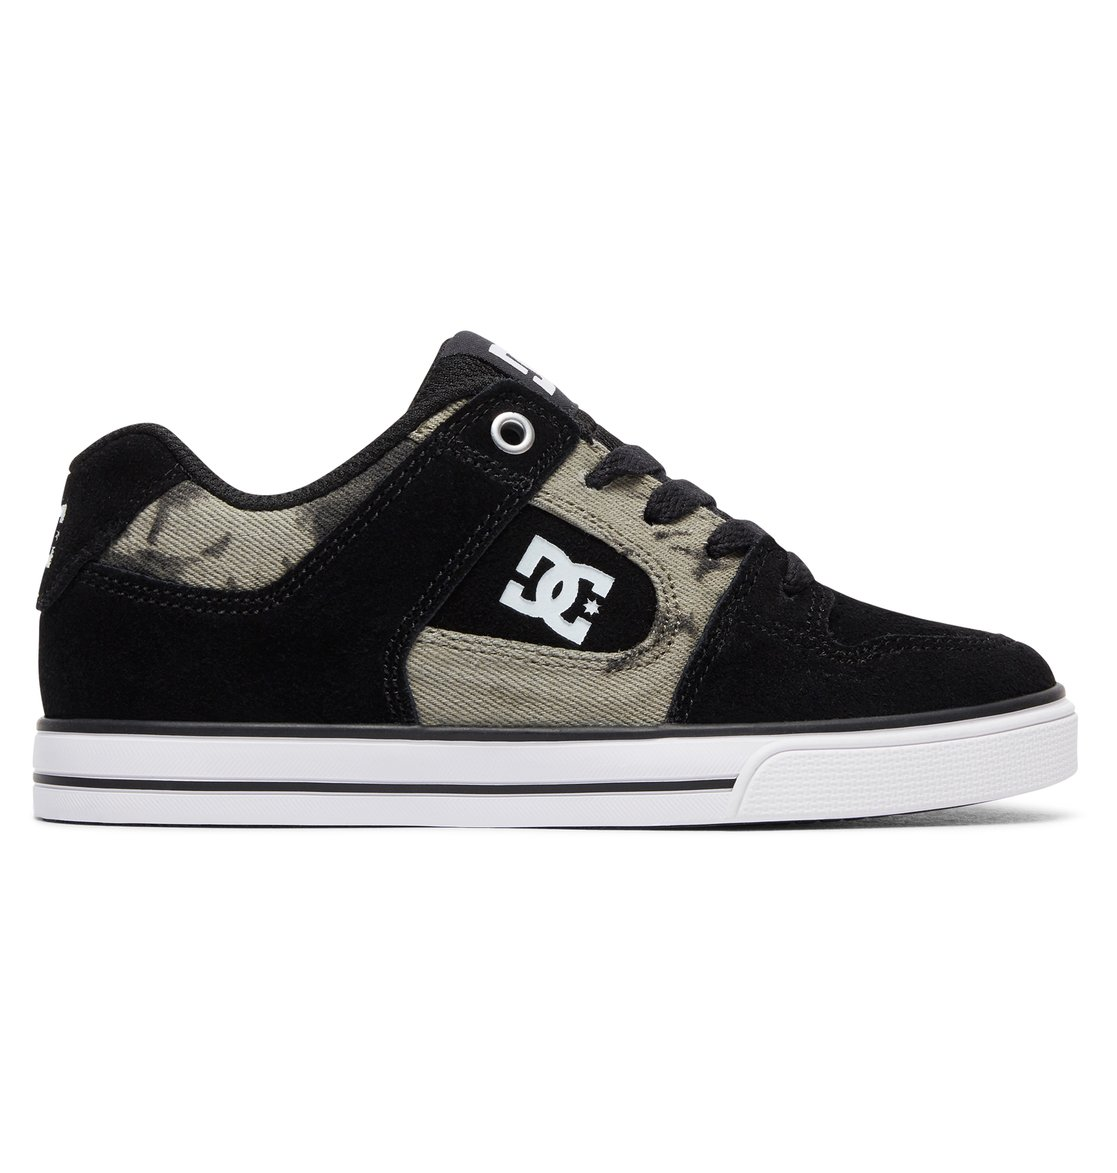 kid 39 s pure se shoes adbs300258 dc shoes. Black Bedroom Furniture Sets. Home Design Ideas